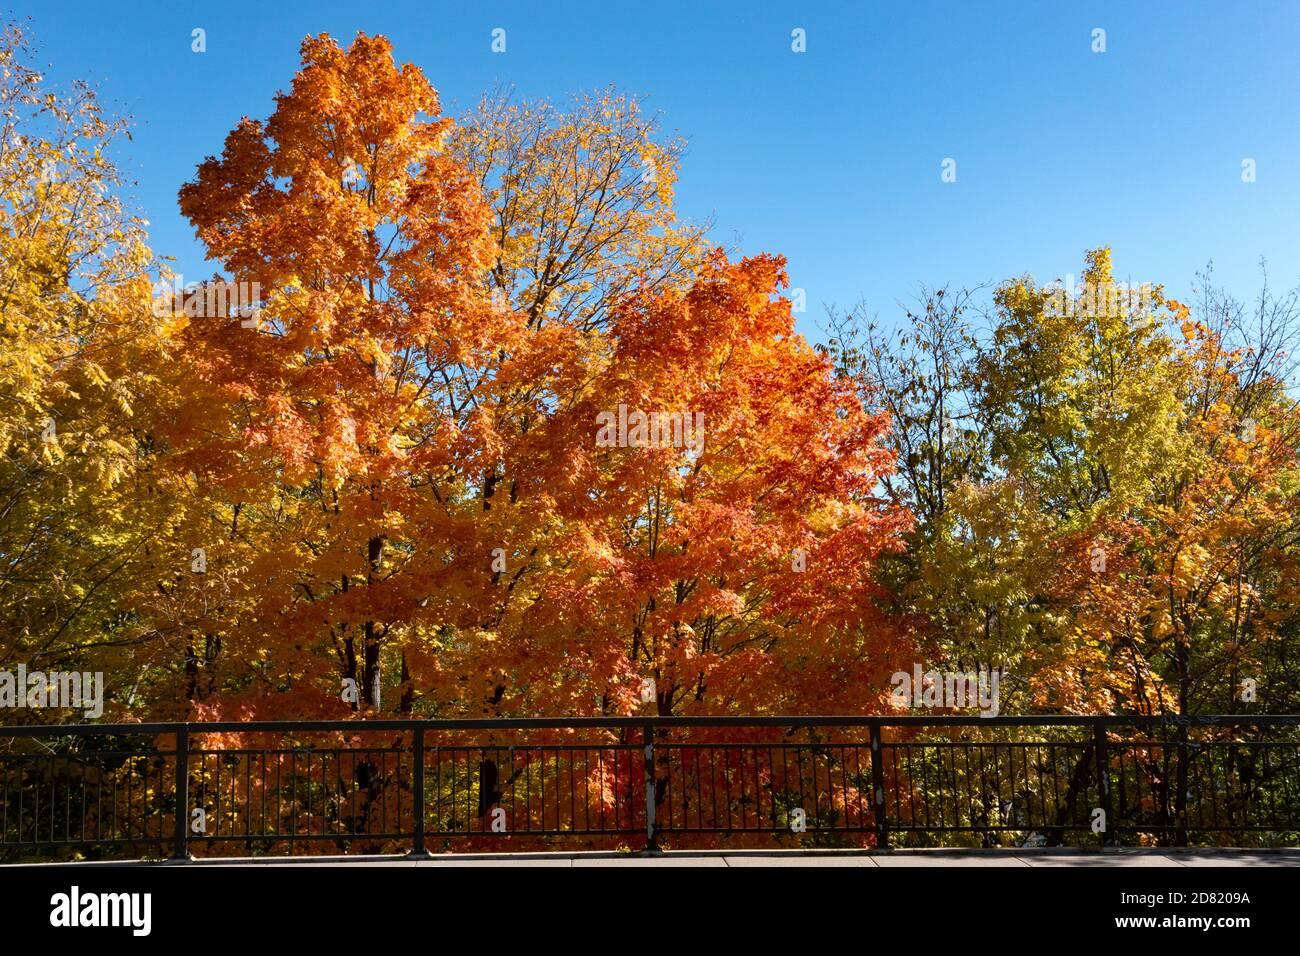 Coloridos árboles de otoño a lo largo del North Mississippi River Boulevard. St Paul Minnesota MN EE.UU Foto de stock